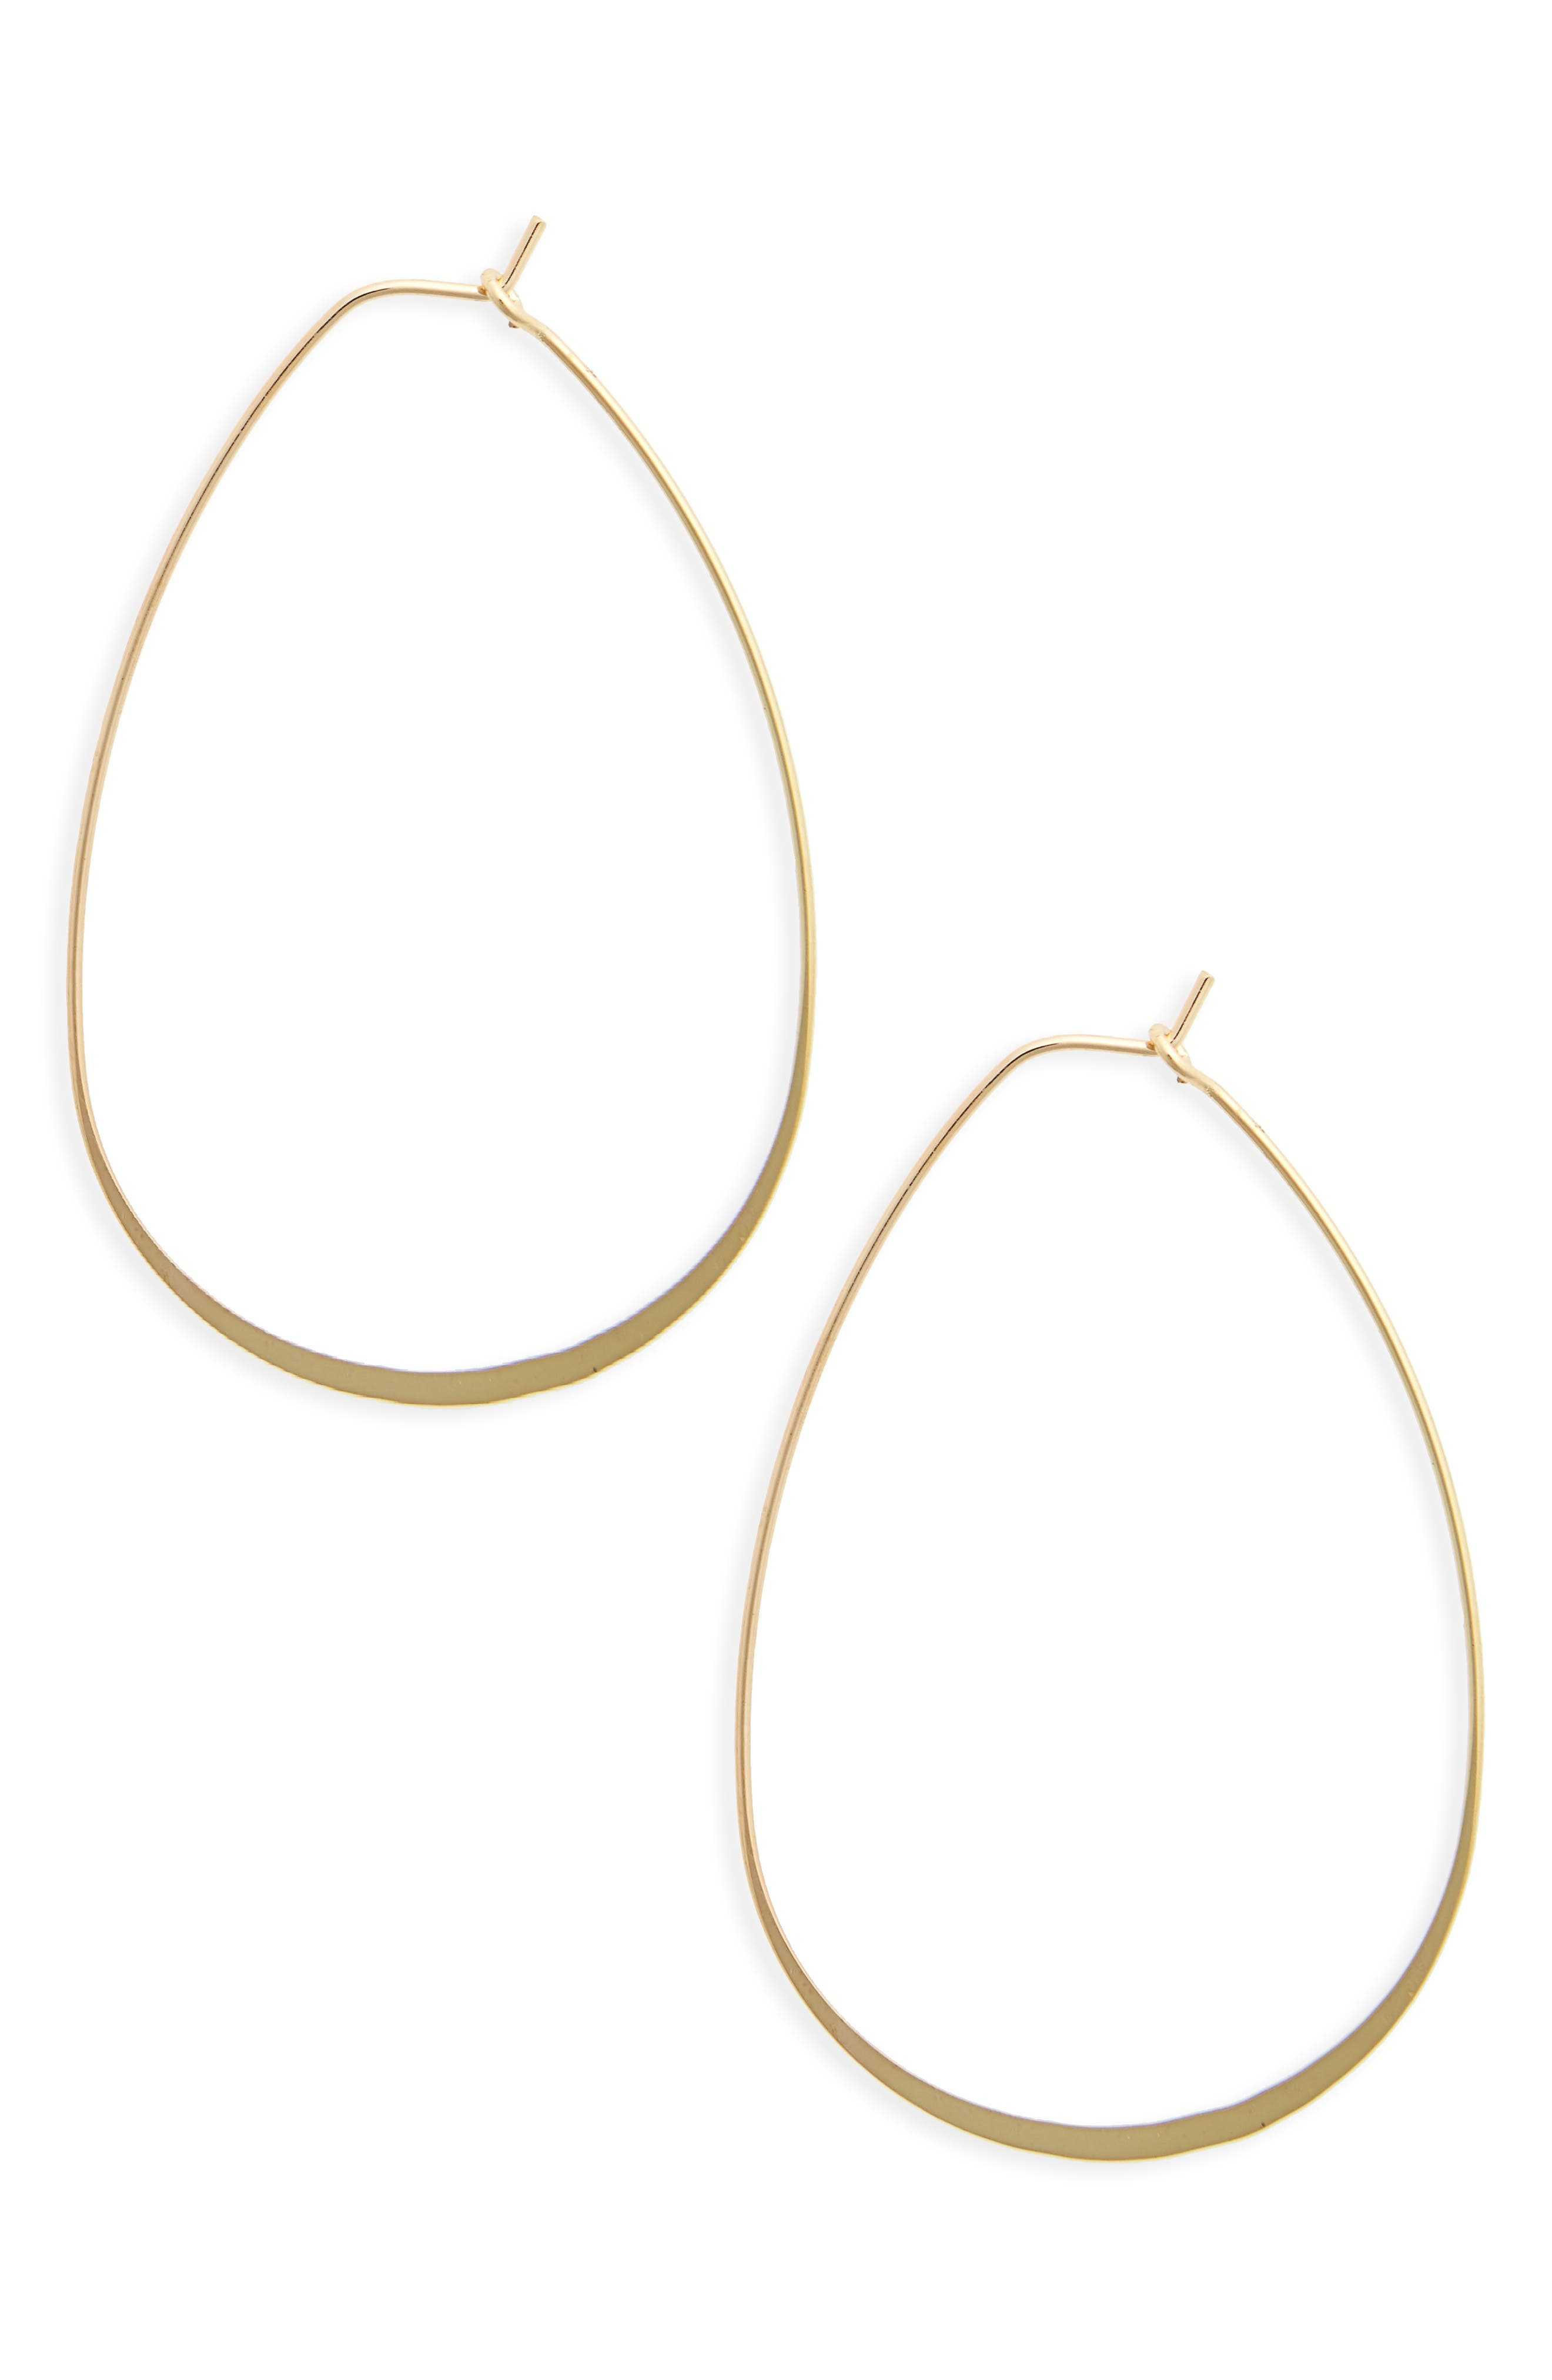 Flat Oval Hoop Earrings,                         Main,                         color, Gold